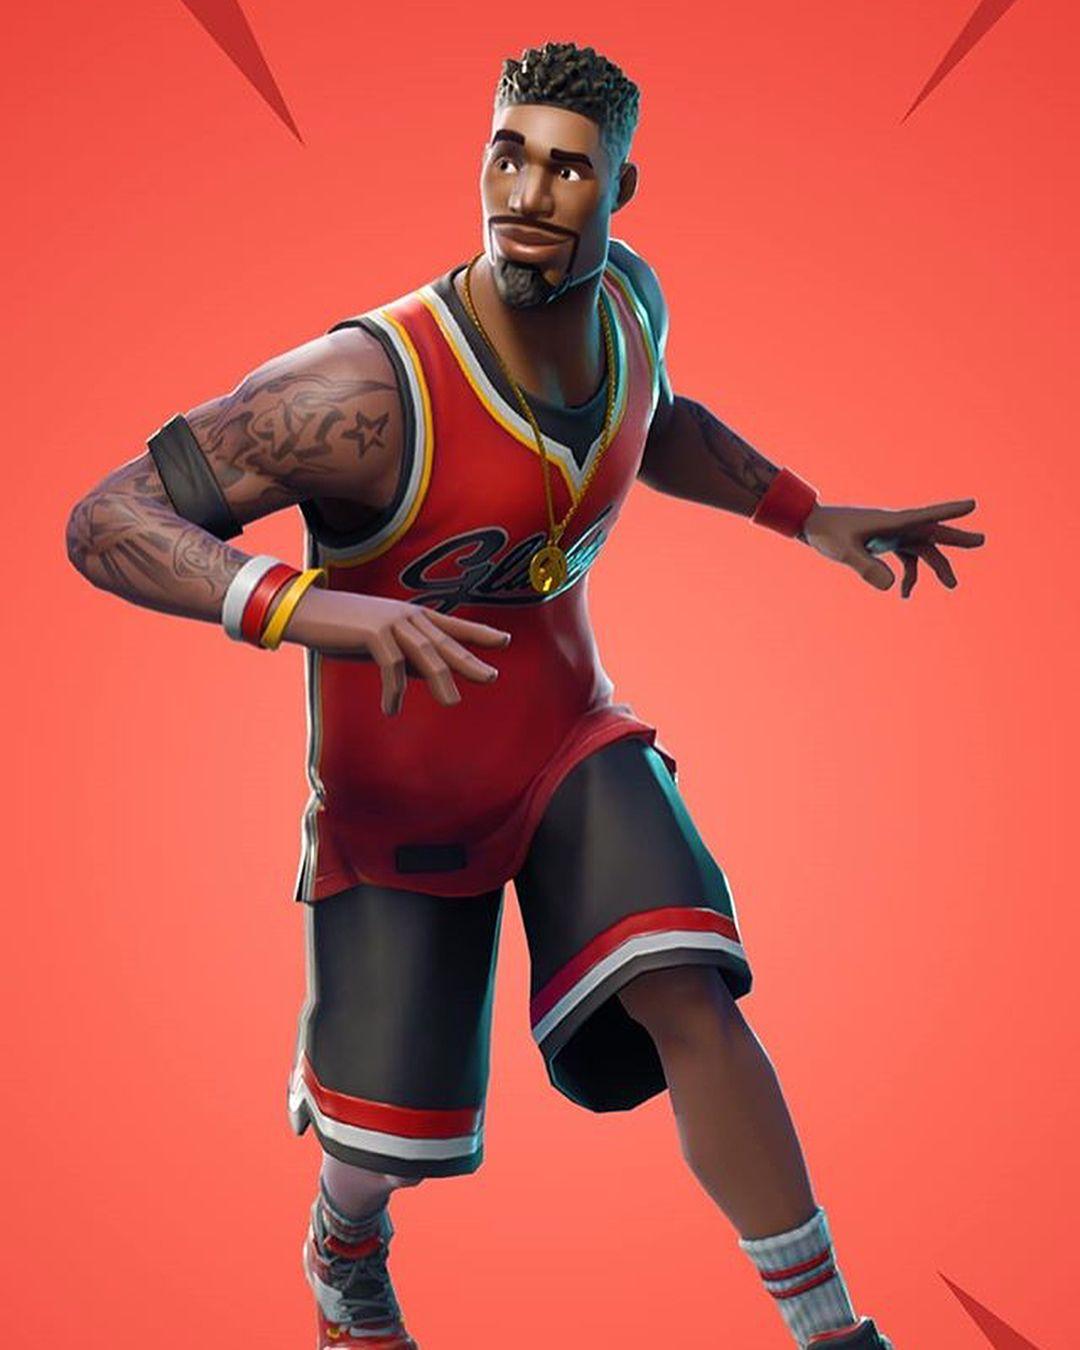 Nueva skin de baloncesto Fortnite 1080x1350